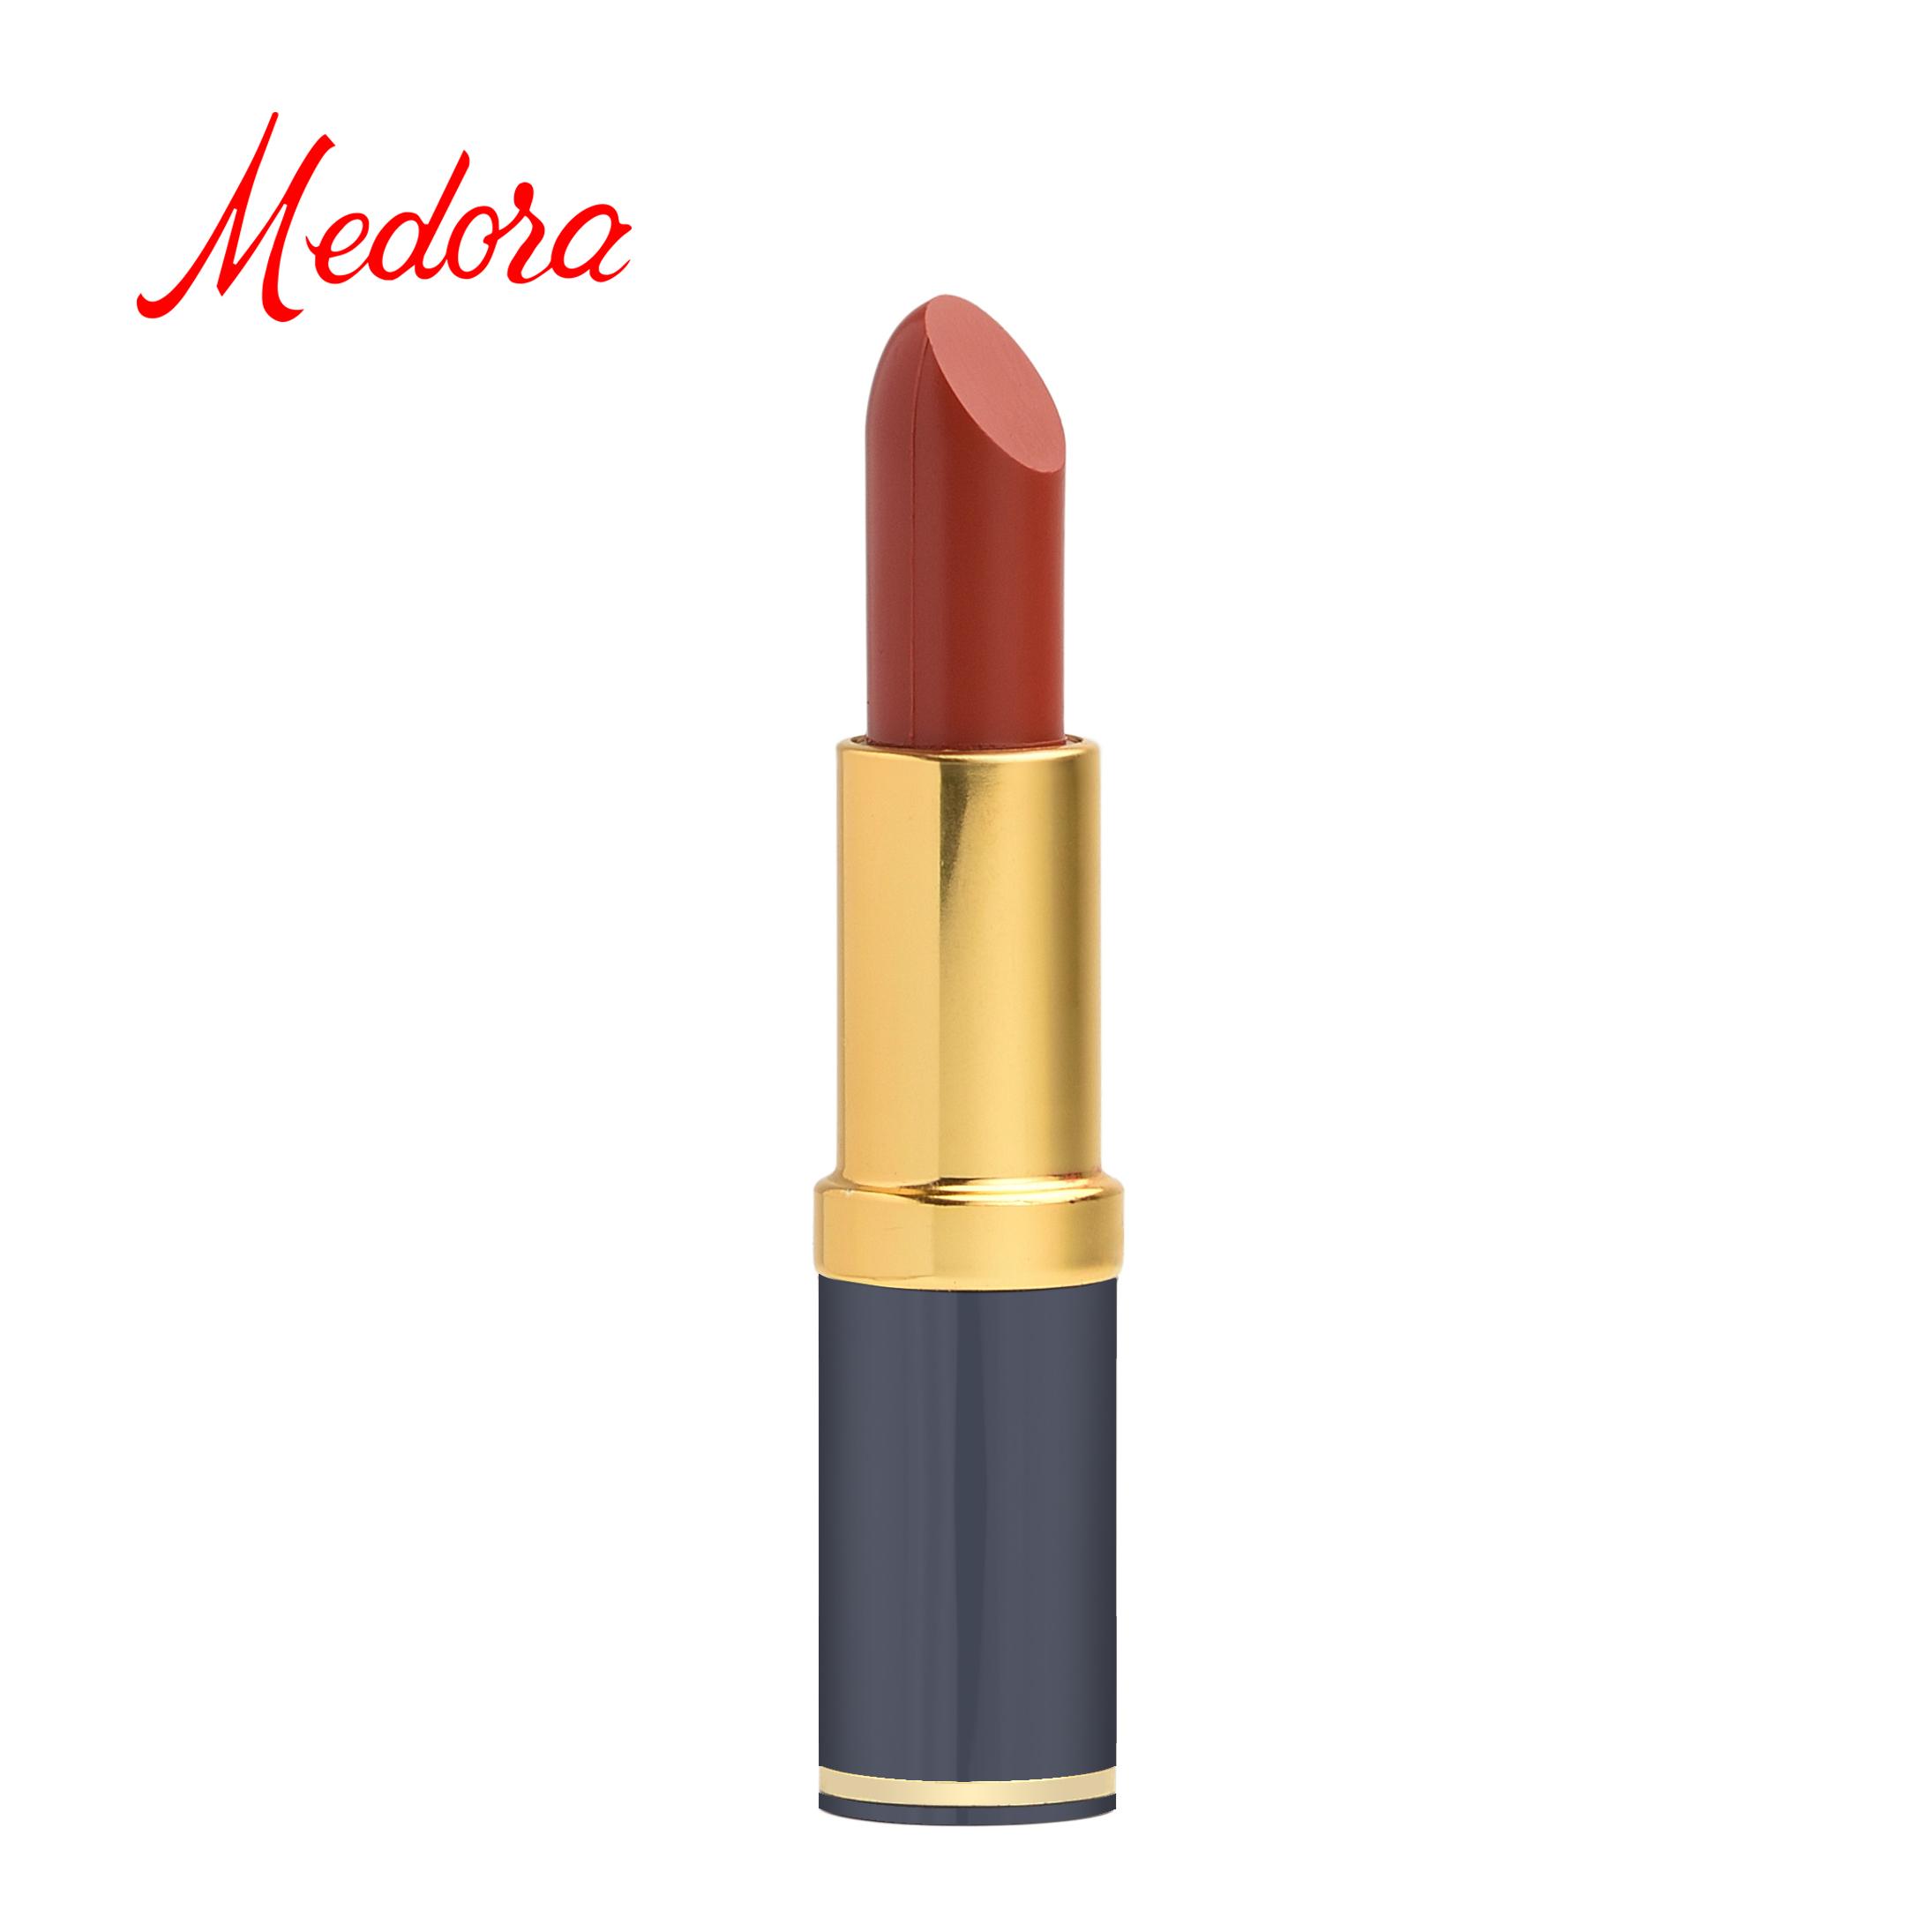 MEDORA Matte Lipstick- 287 RUSSET